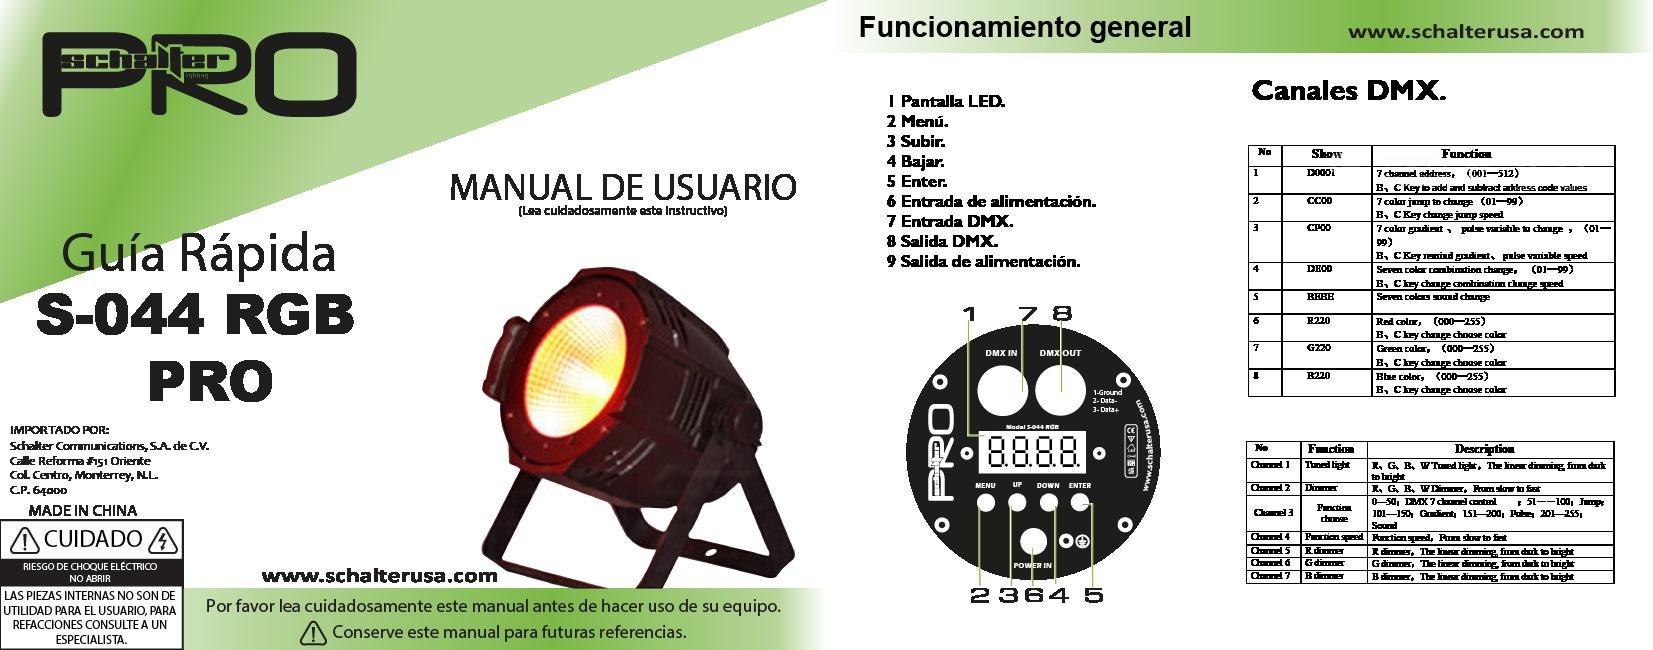 guia rapida S-044 RGB-01